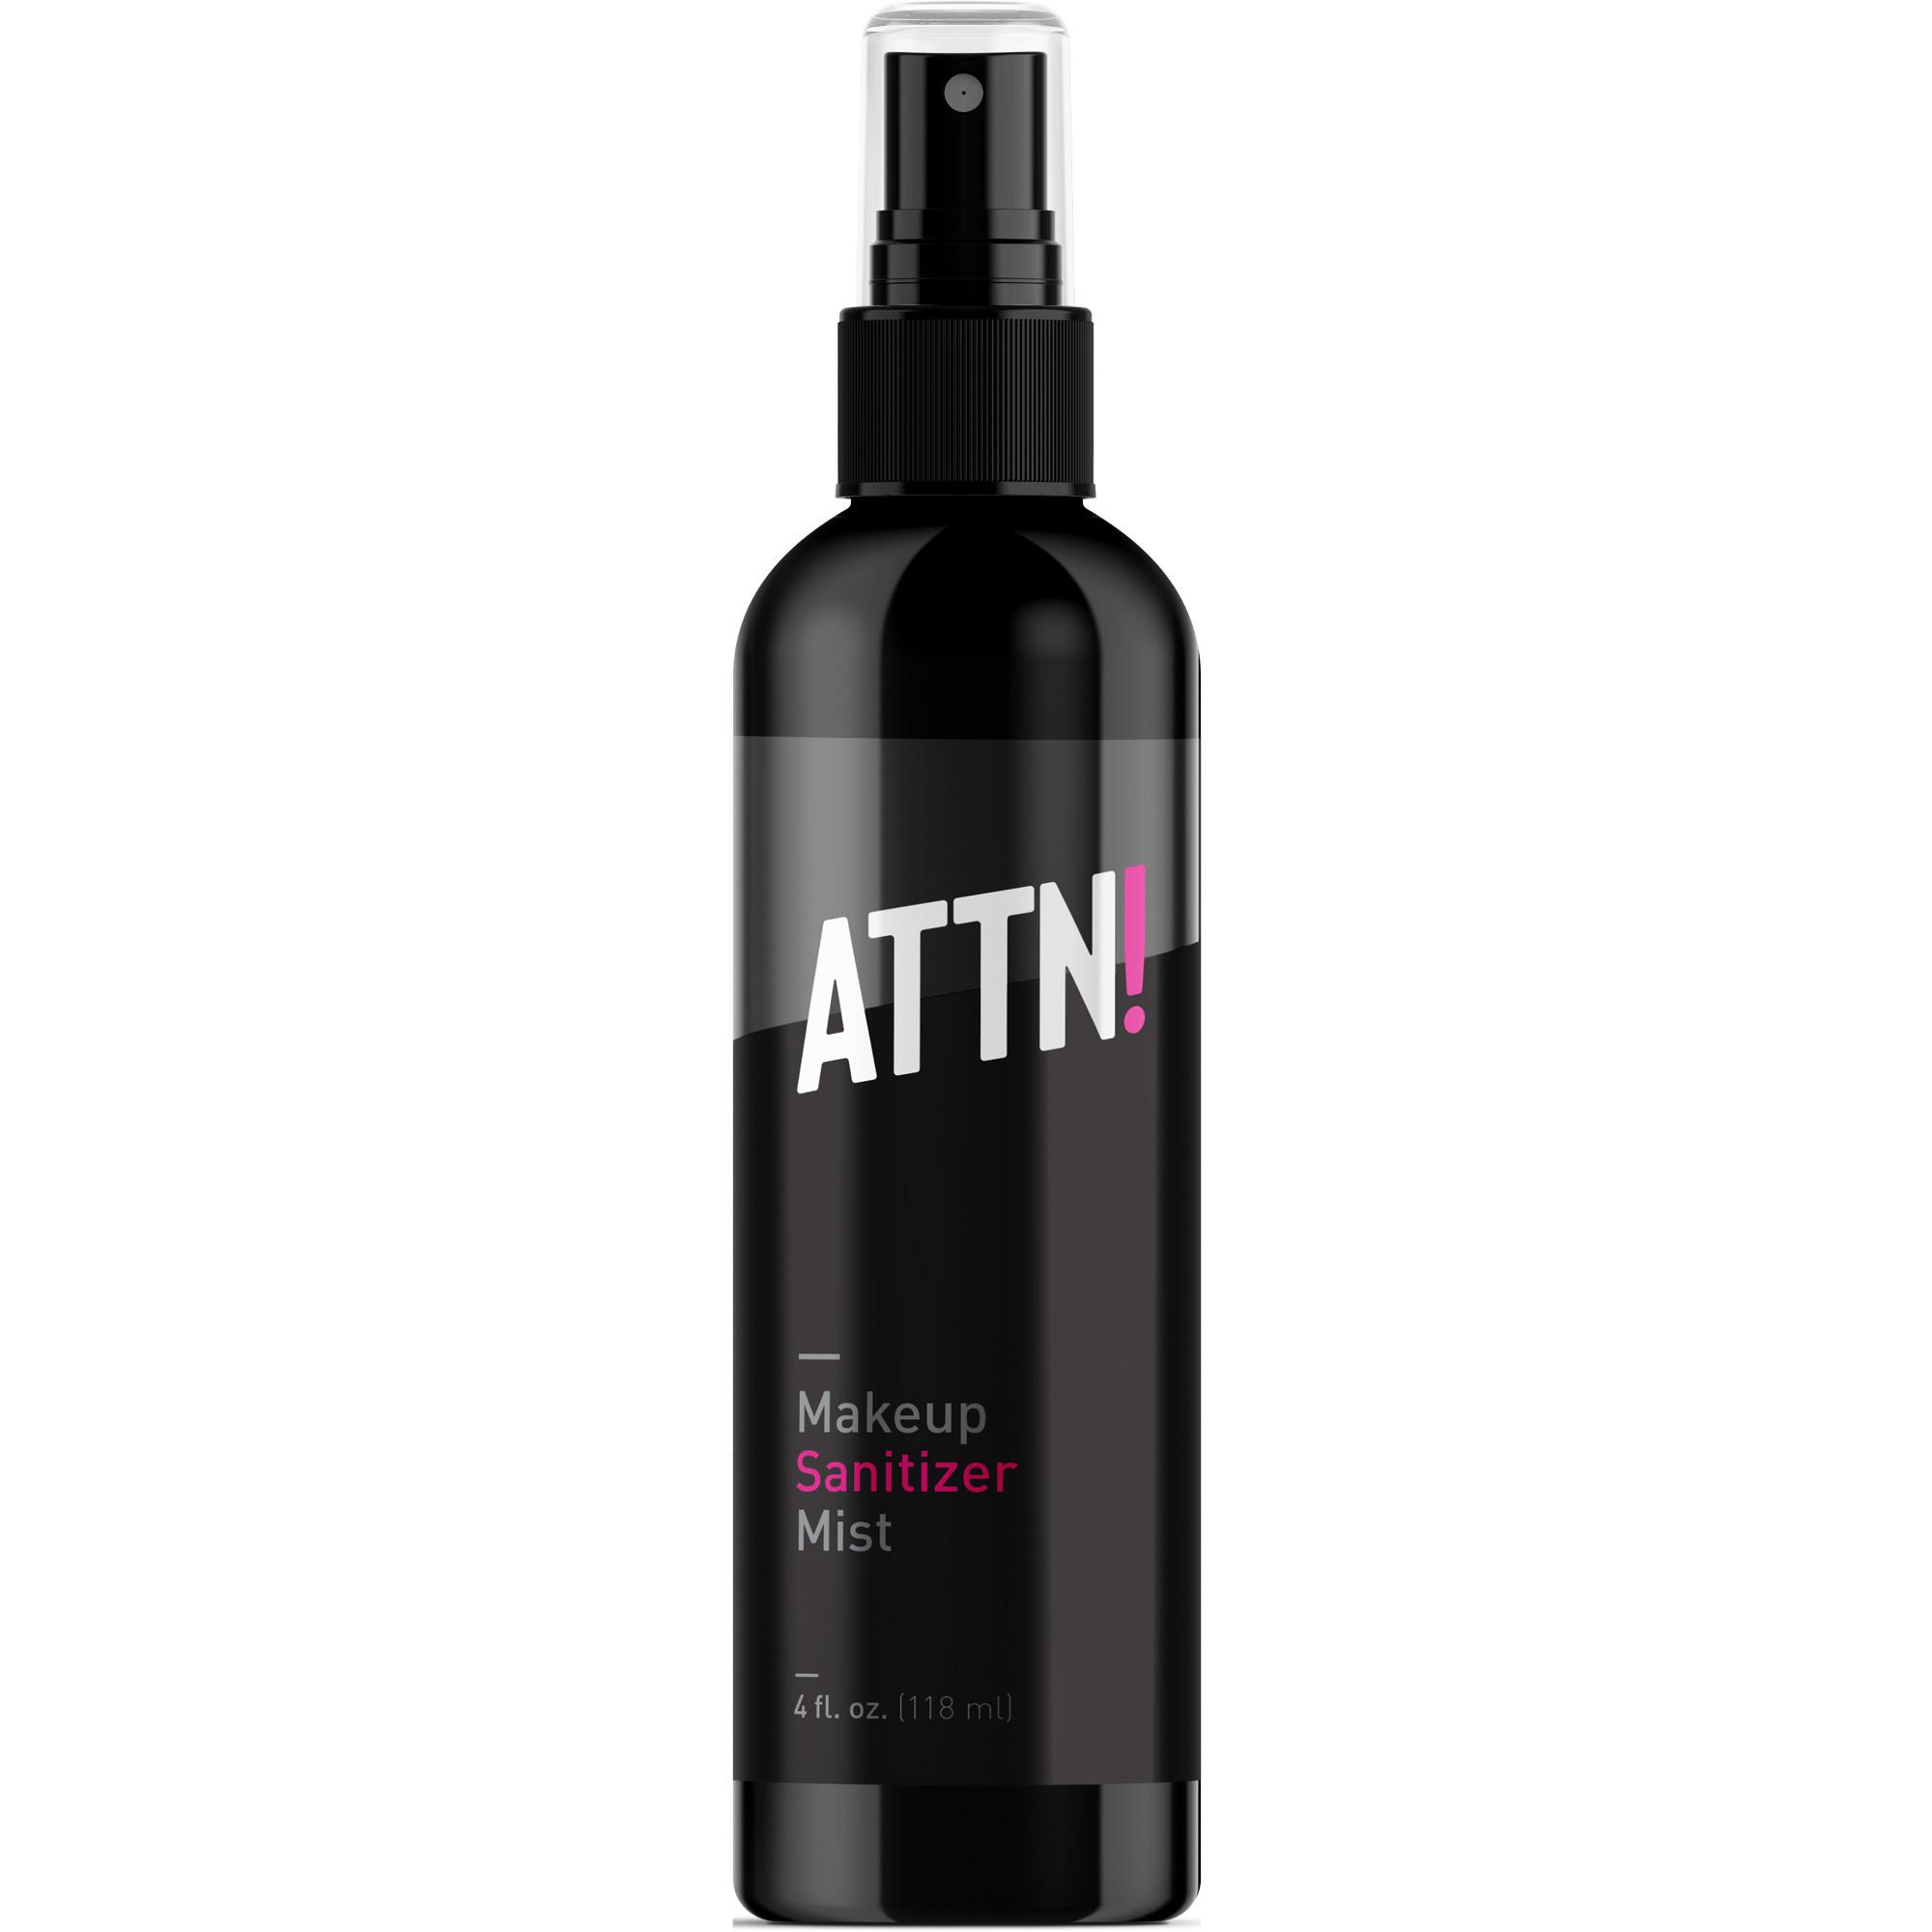 ATTN! Makeup Sanitizer Mist -